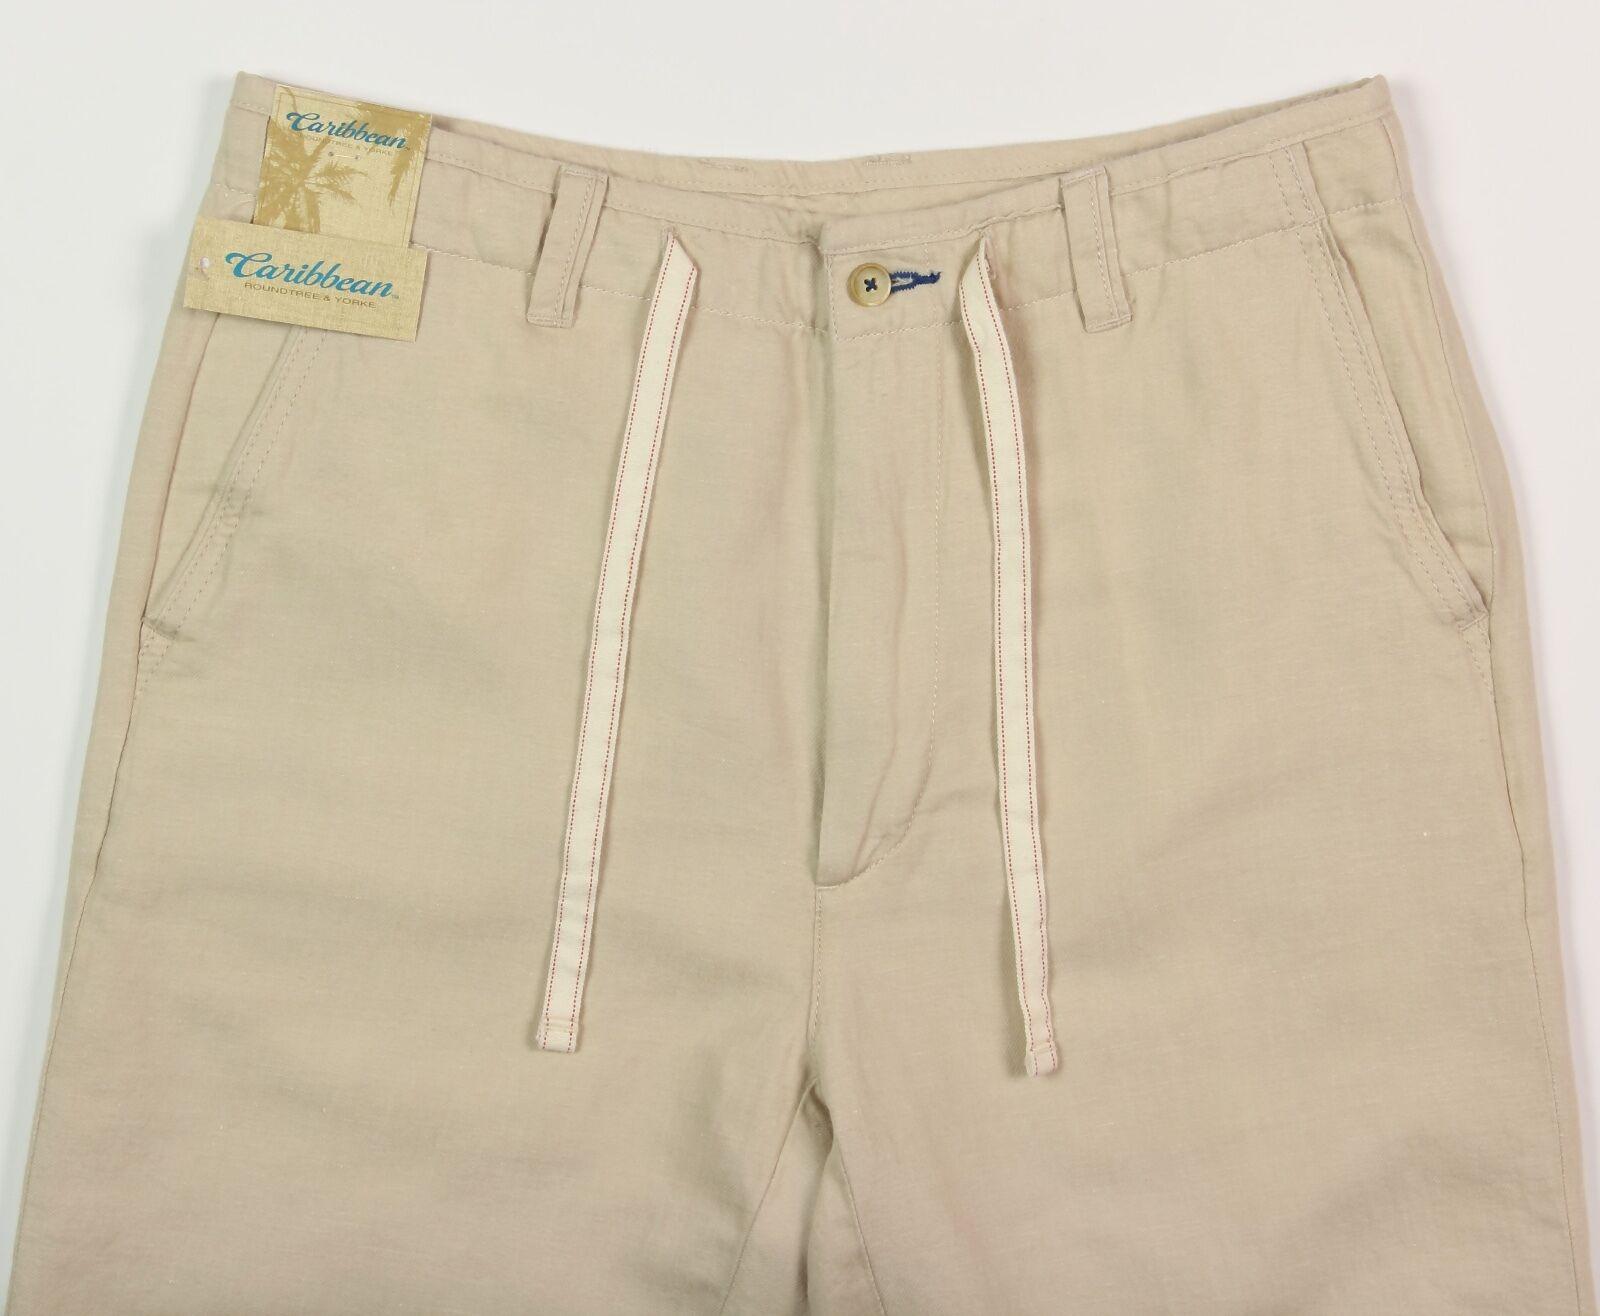 Men's CARIBBEAN Natural Light Khaki LINEN COTTON Drawstring Pants 32x32 NEW NWT